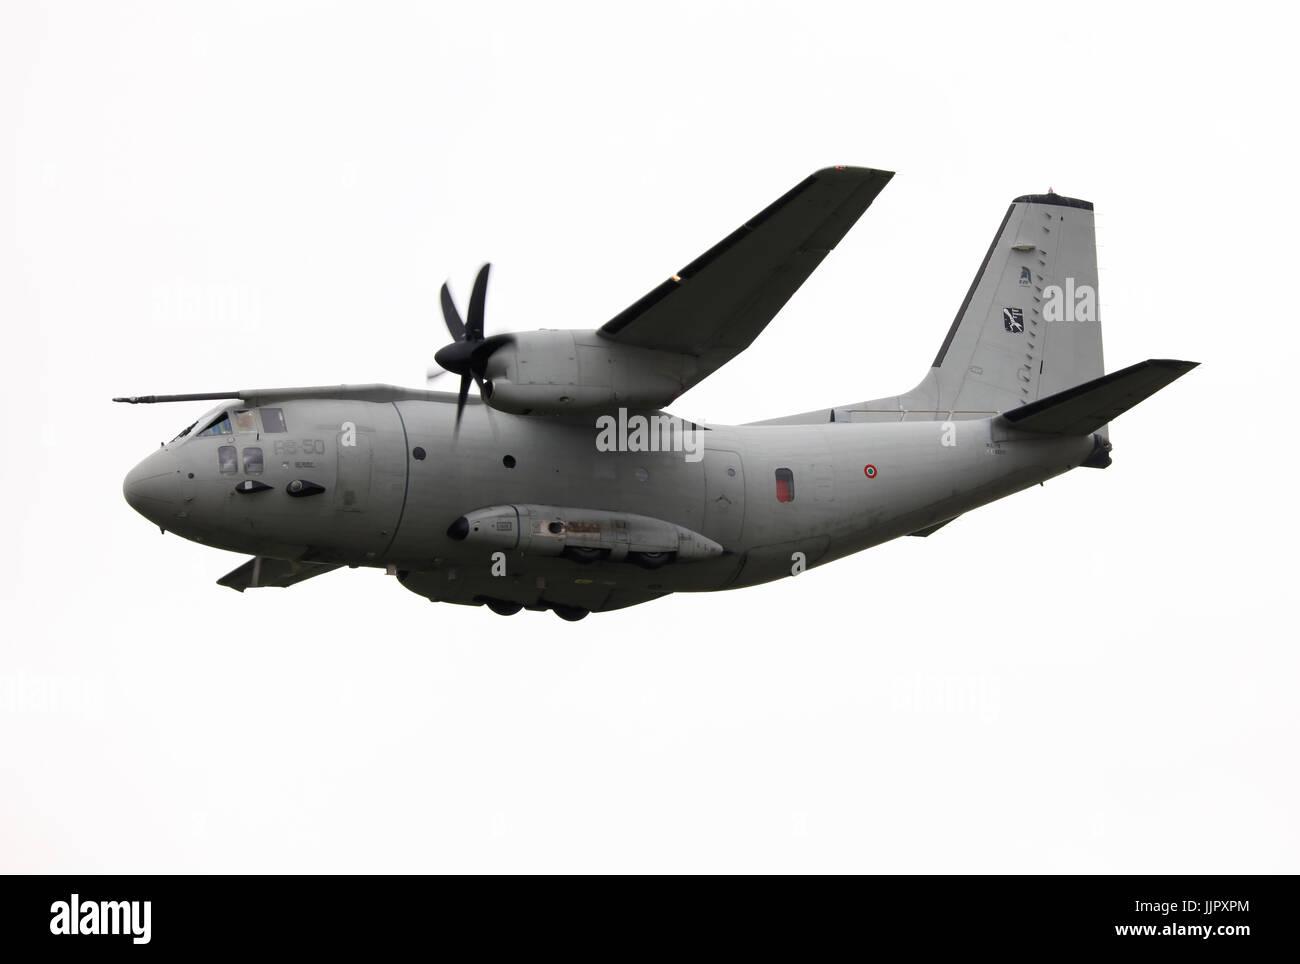 aeronautica militare italian air force alenia c-29j - Stock Image